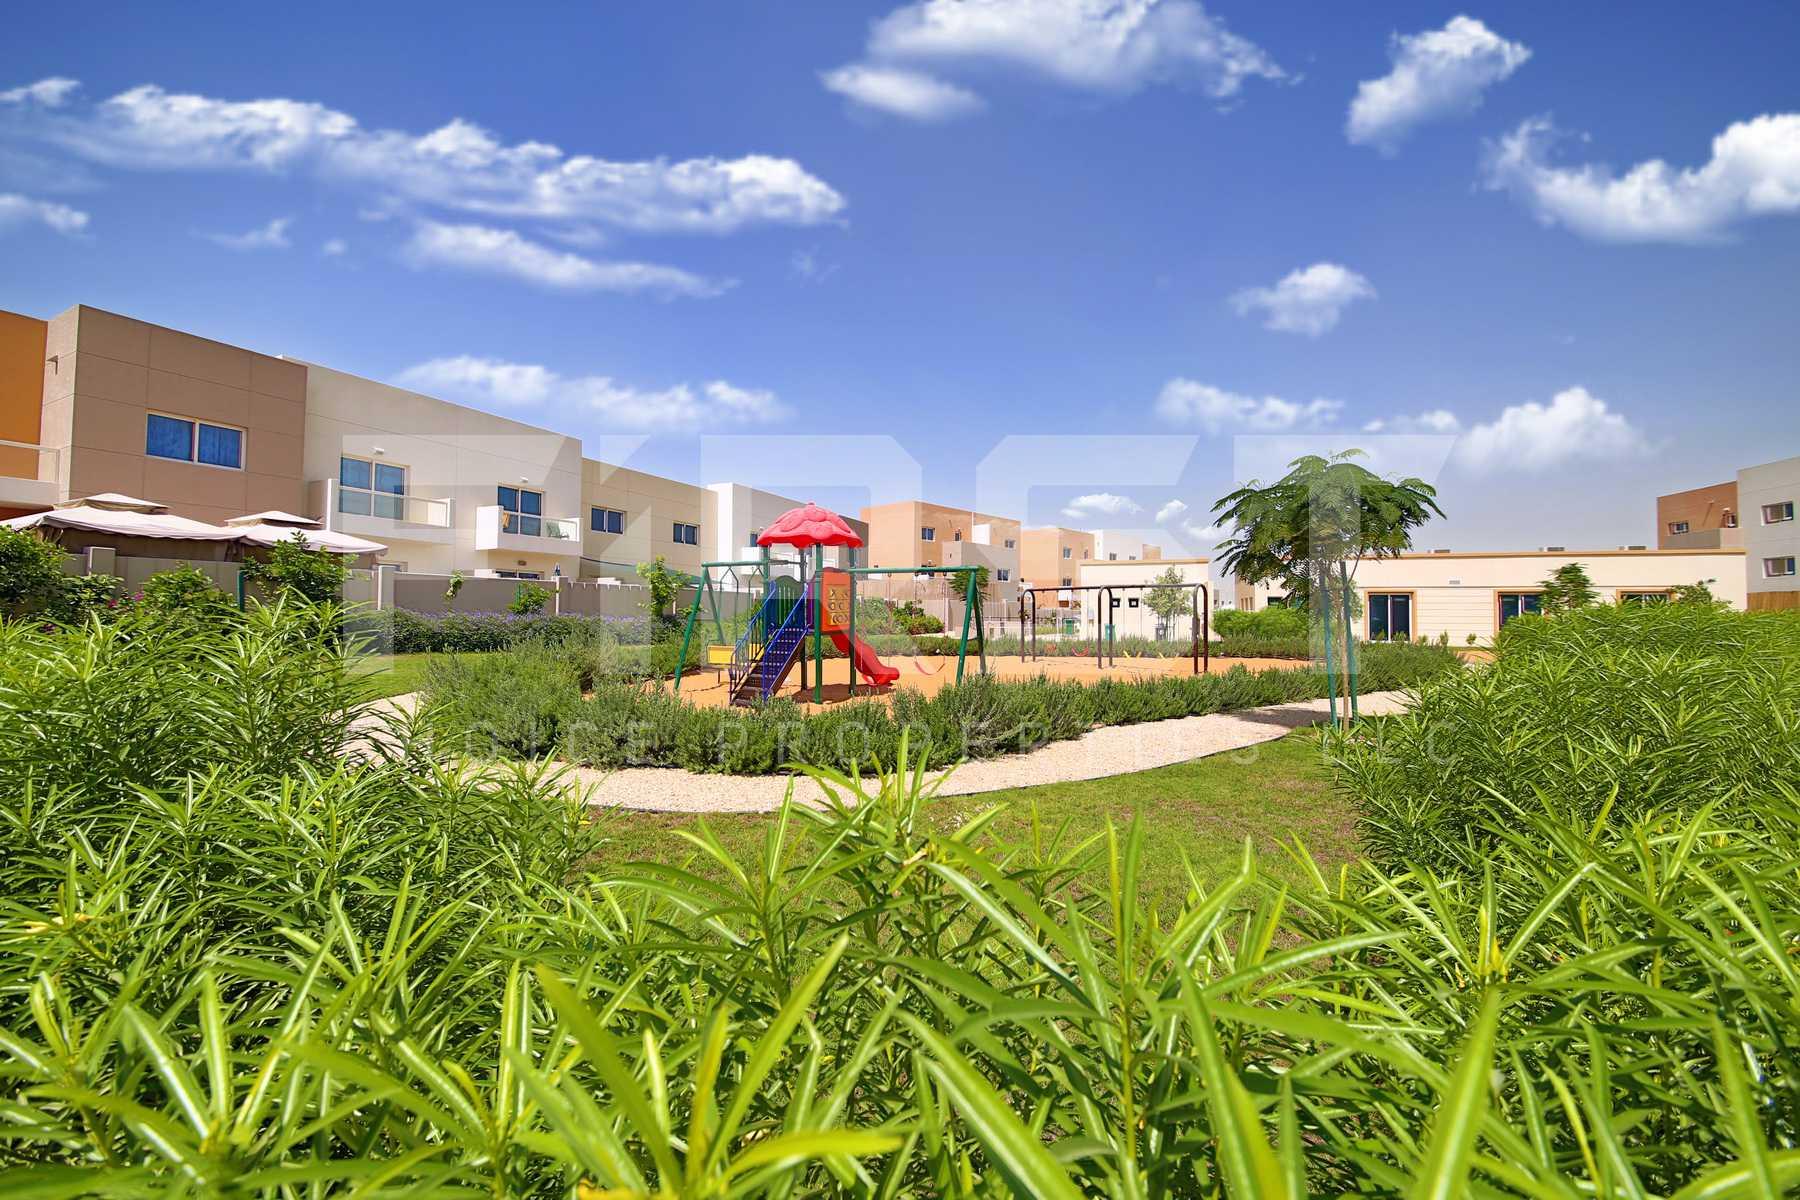 External Photo of Contemporary Village Al Reef Villas Al Reef Abu Dhabi UAE (10).jpg